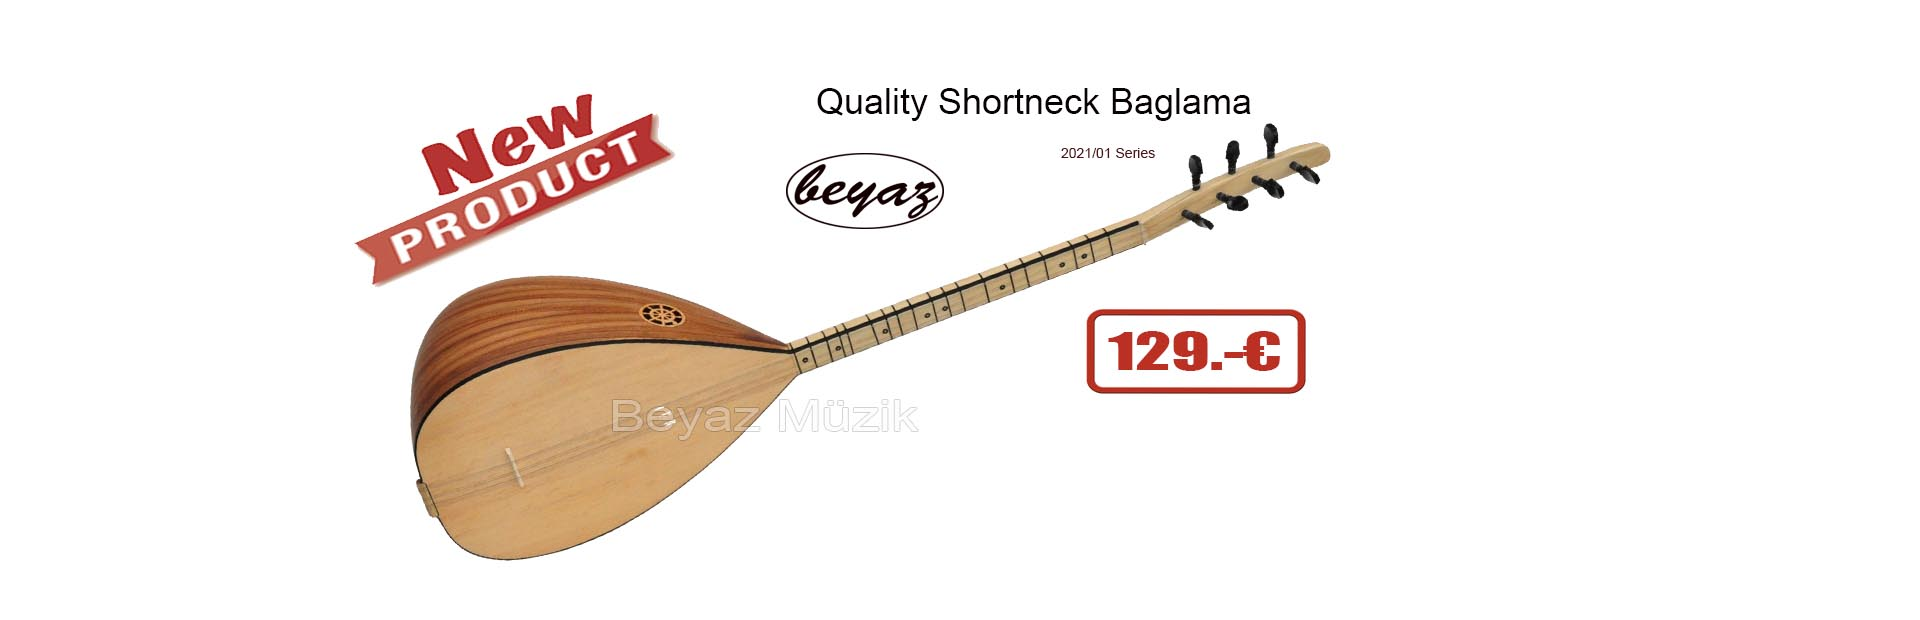 New Serie Shortneck Baglama